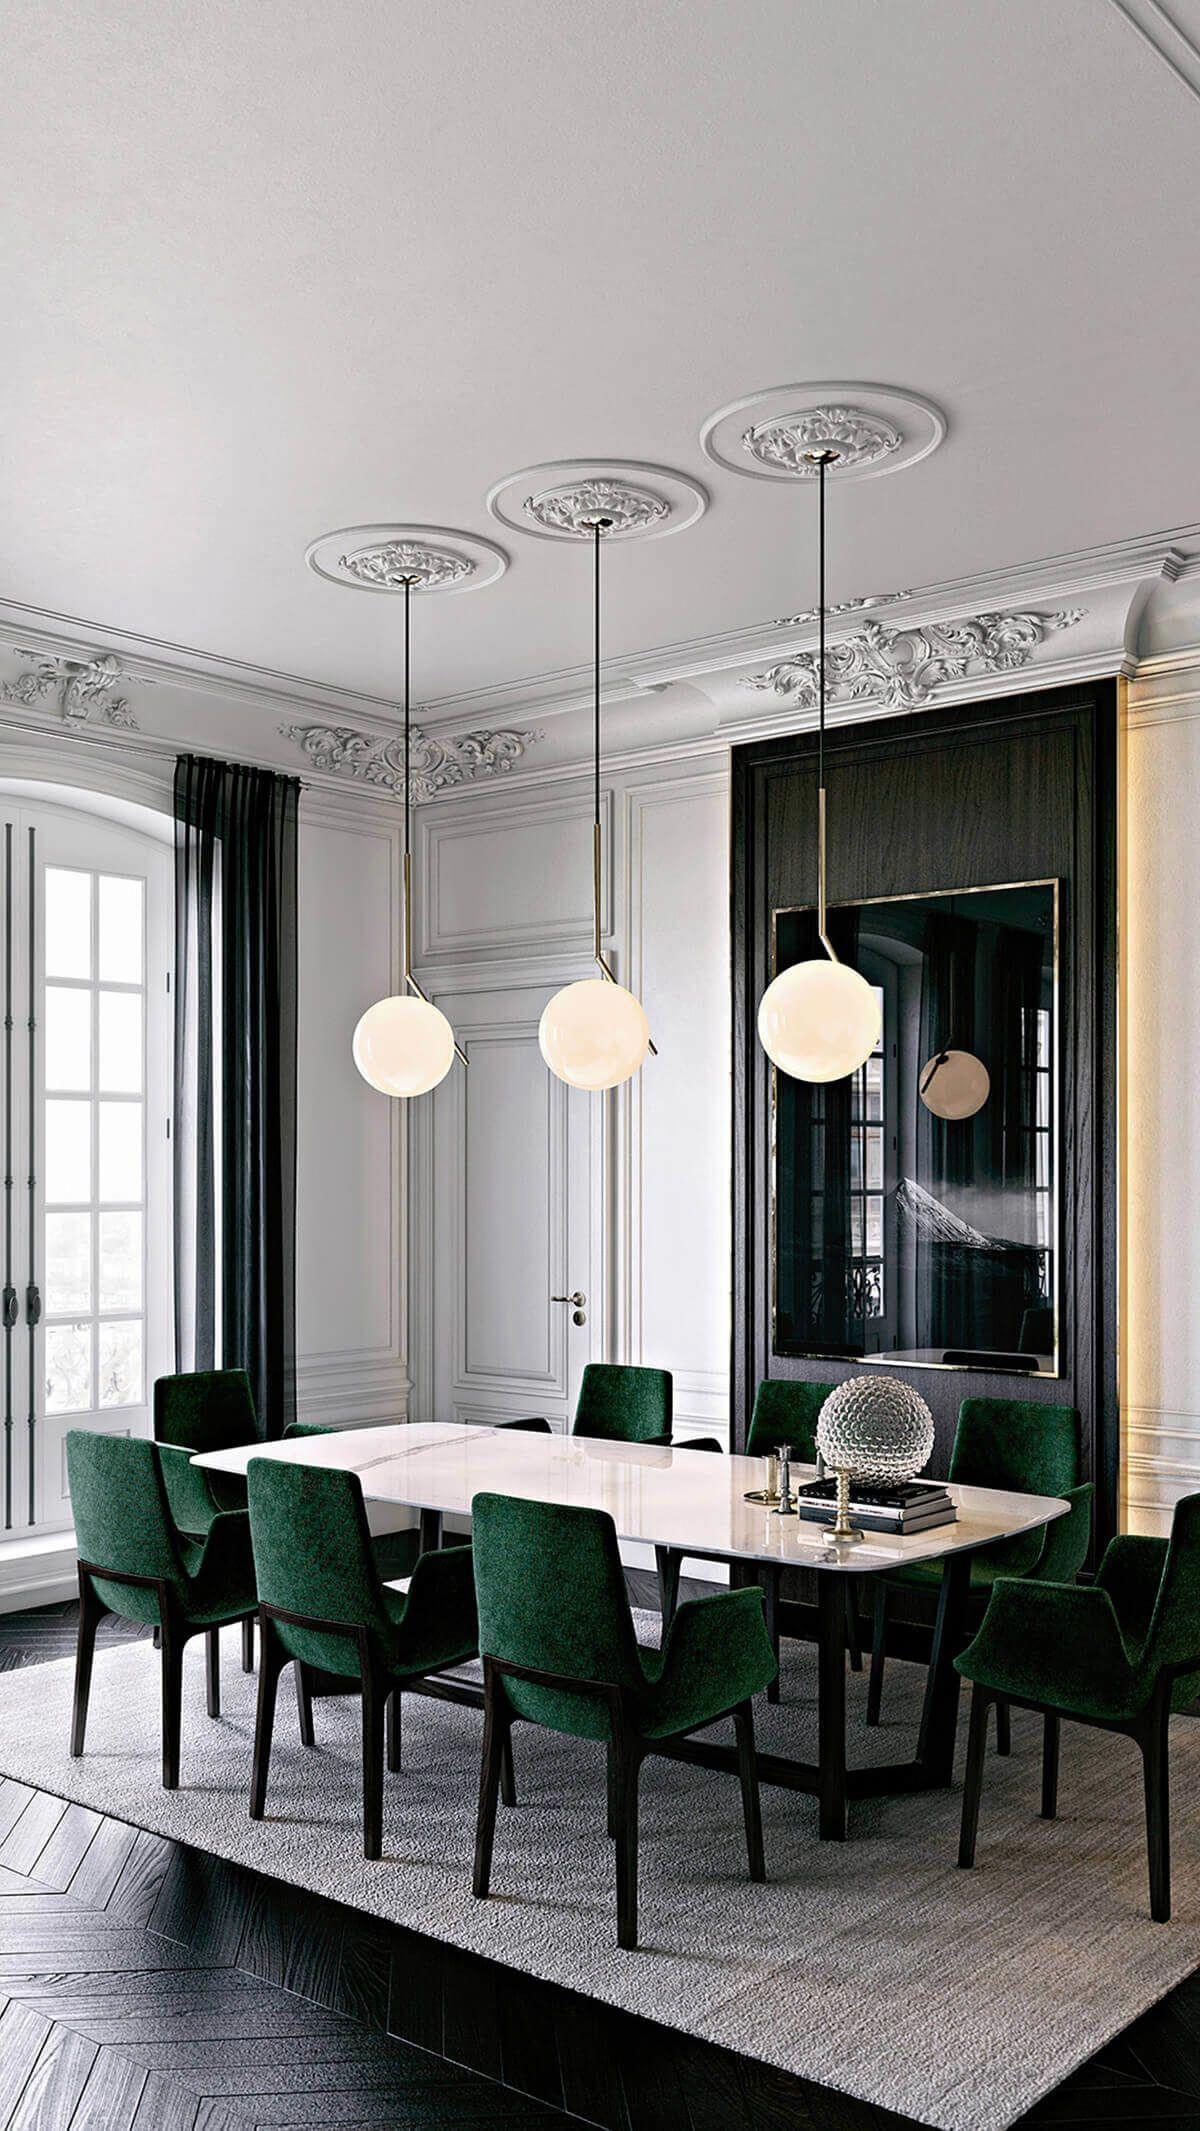 emily henderson parisian art nouveau intro 10 moderninteriors rh pinterest com